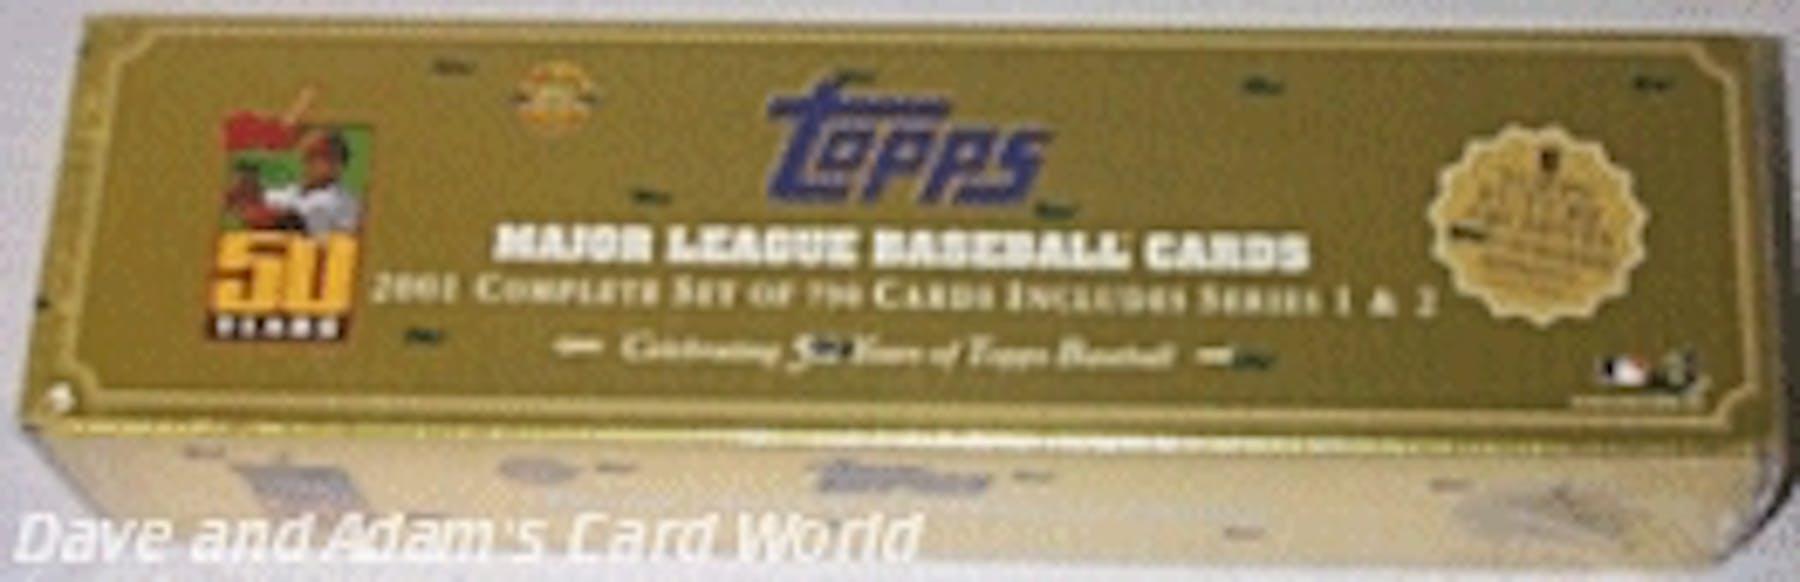 2001 Topps Baseball Hta Factory Set Box Gold